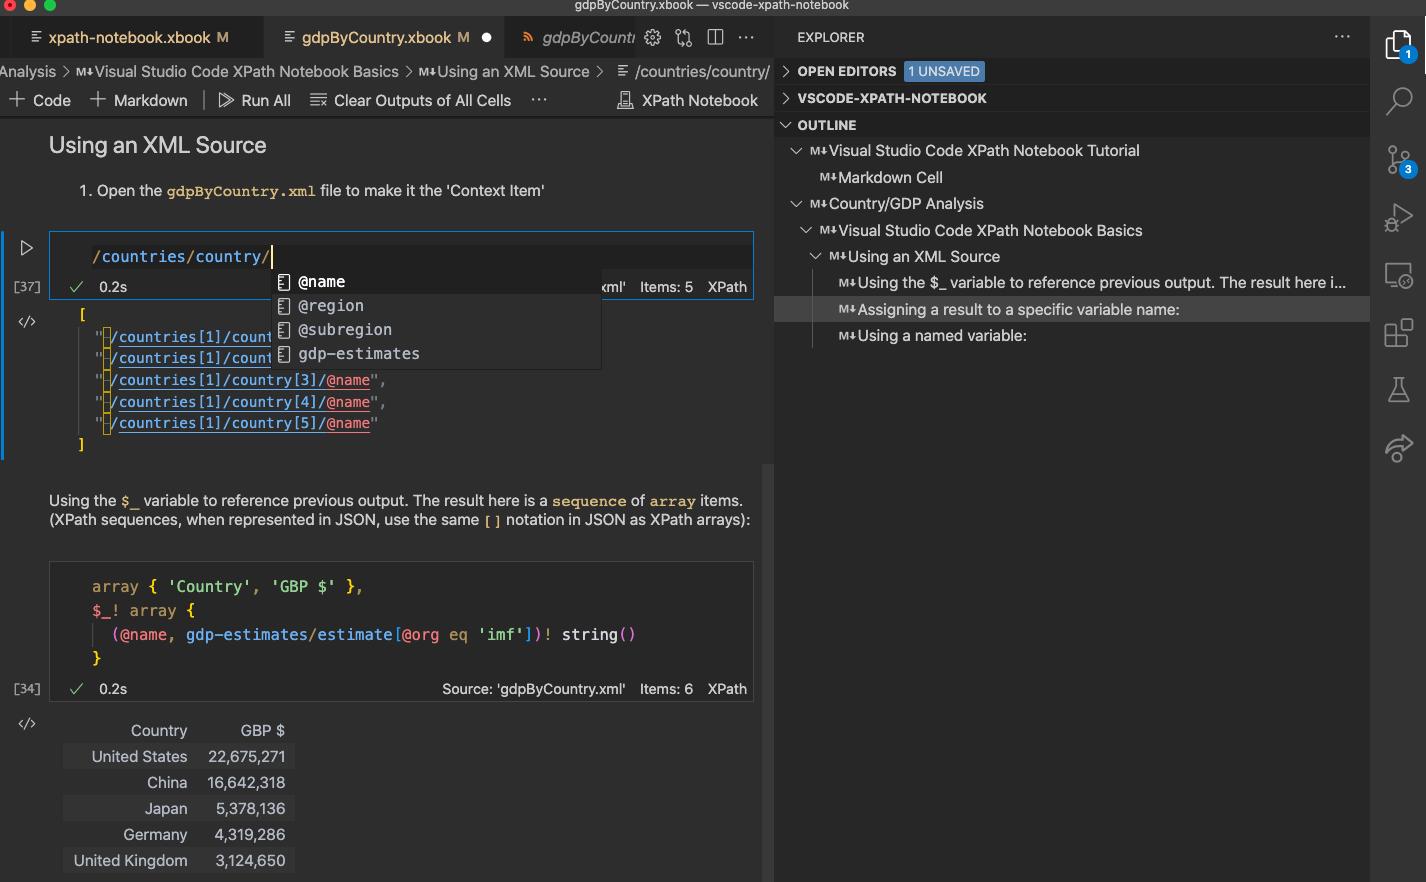 XPath Notebook screenshot